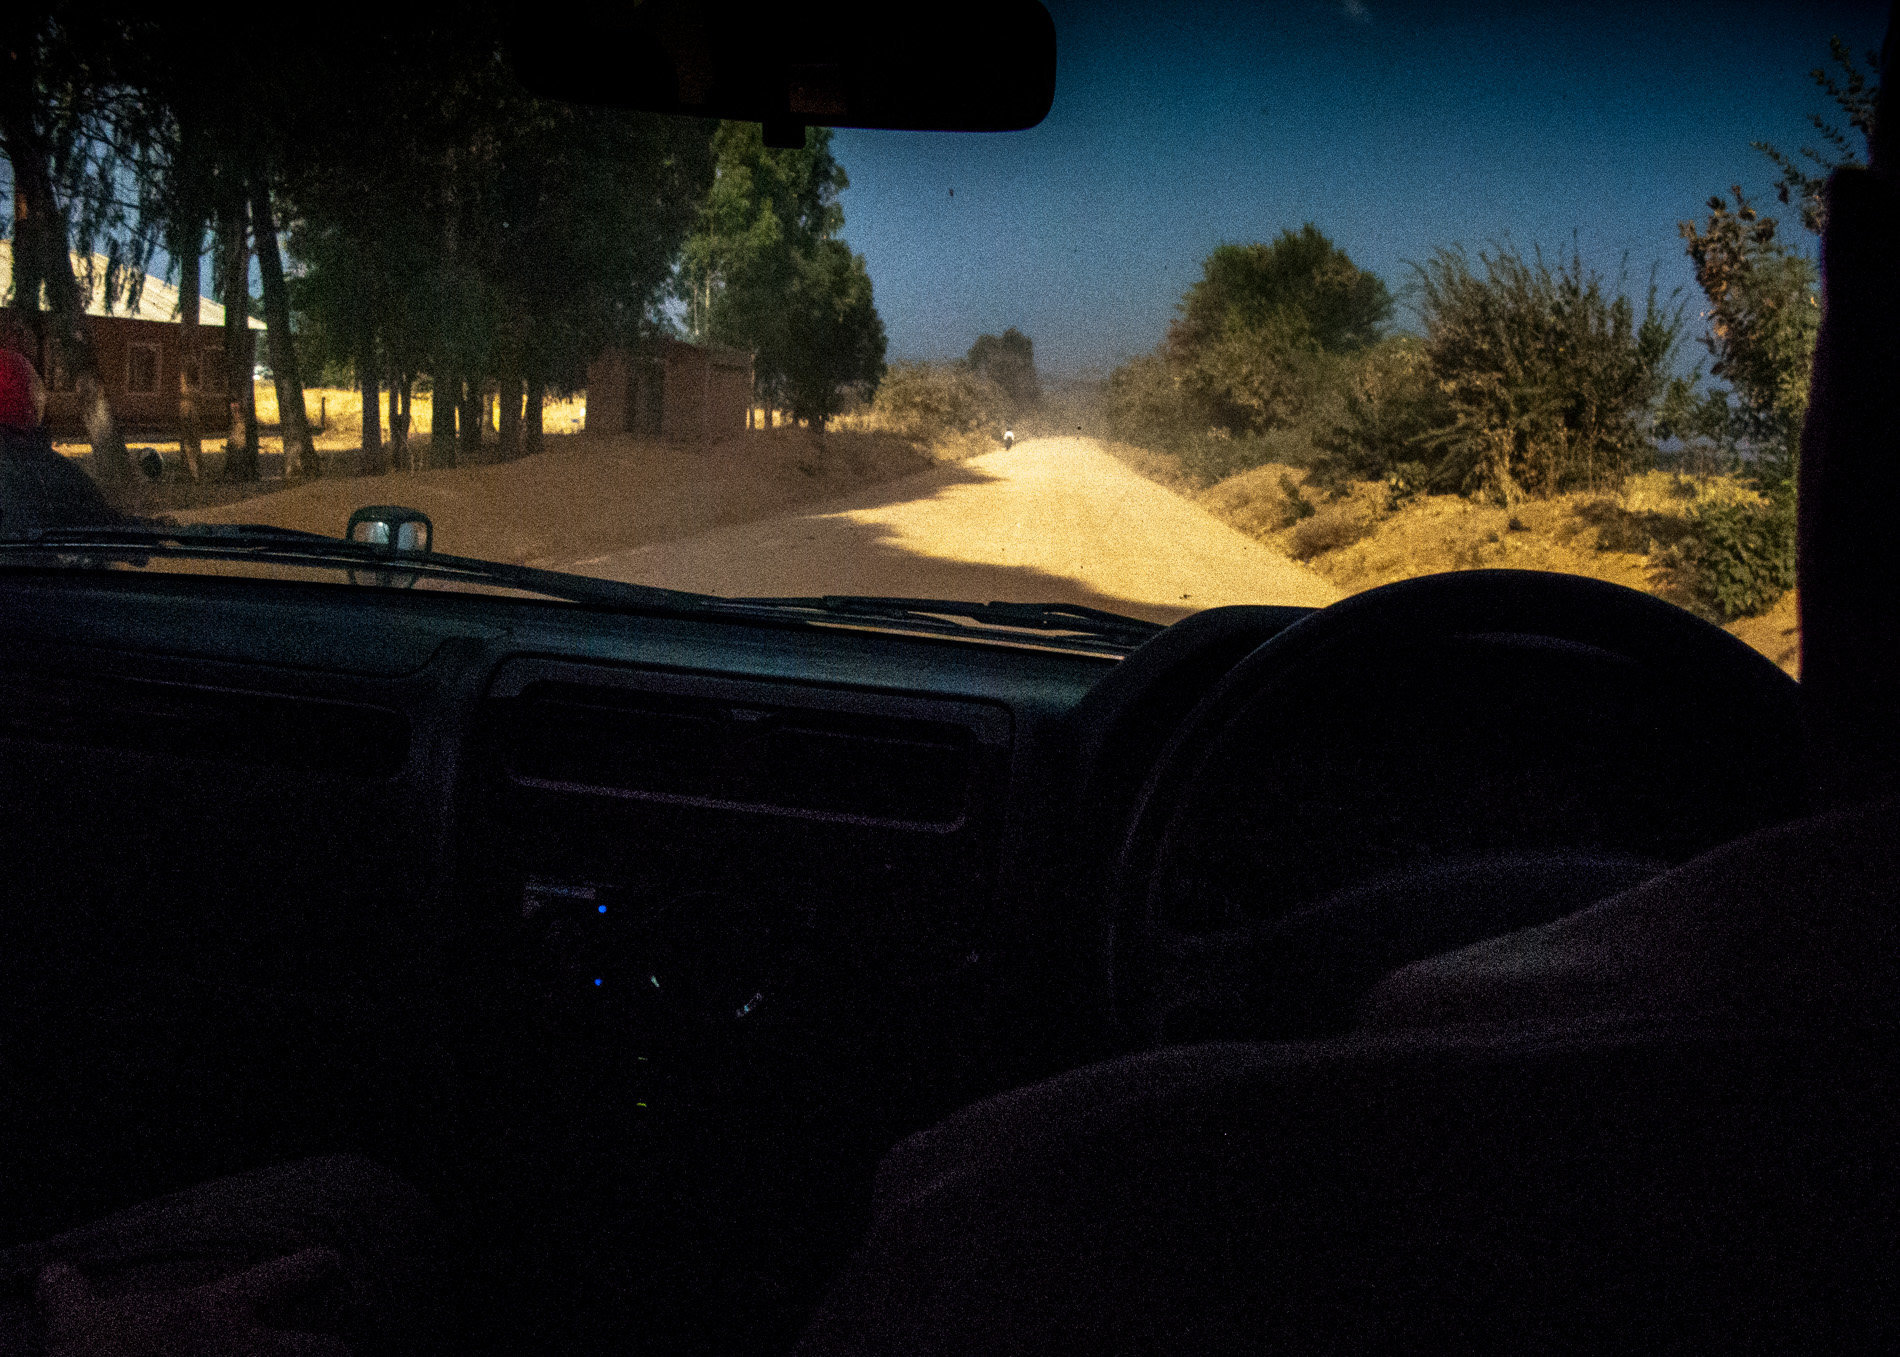 Tanzania,_Back_Seat_View-1708.jpg